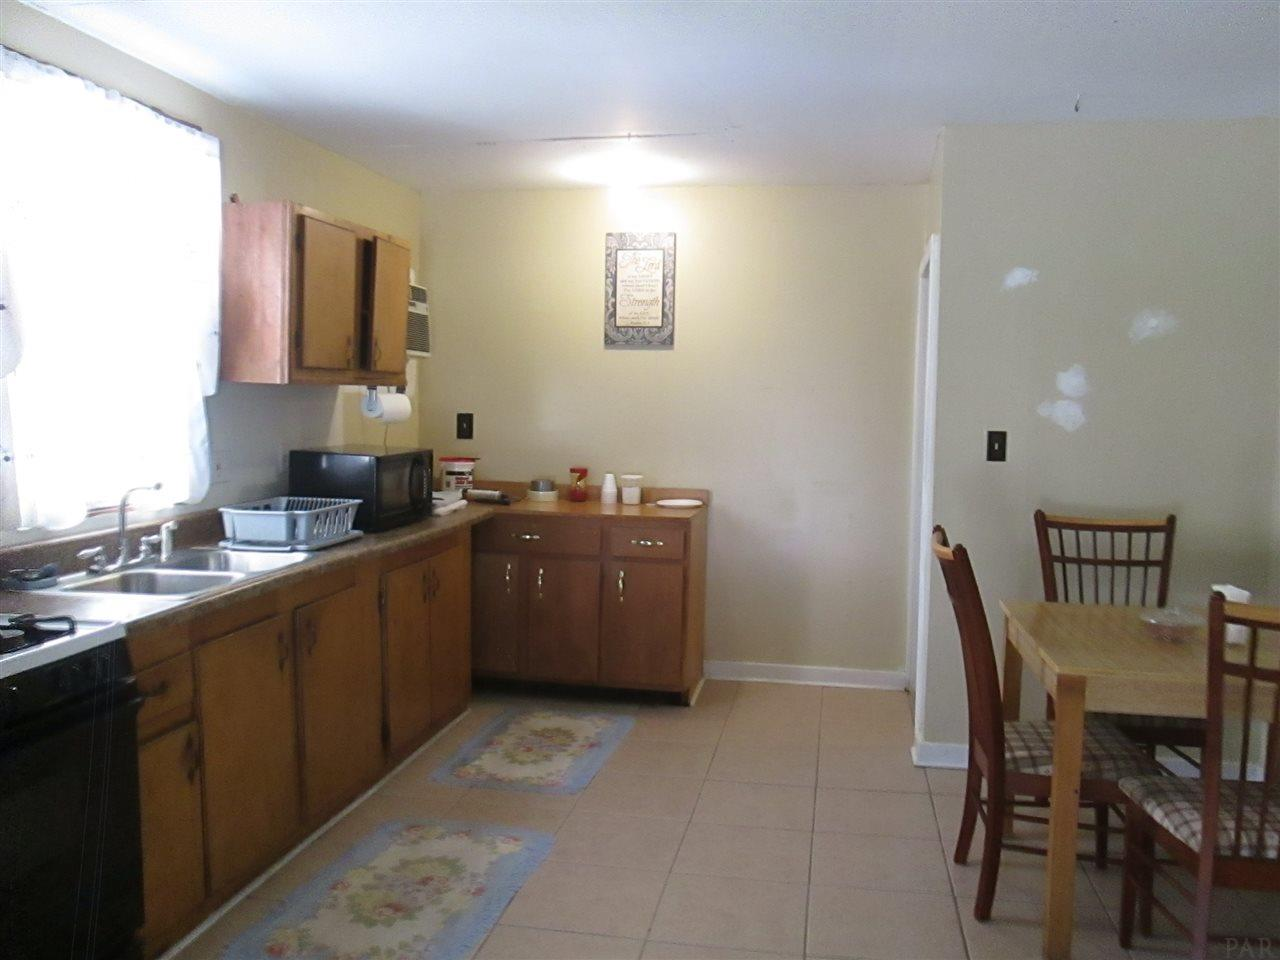 605 Washington St, Cantonment, FL 32533